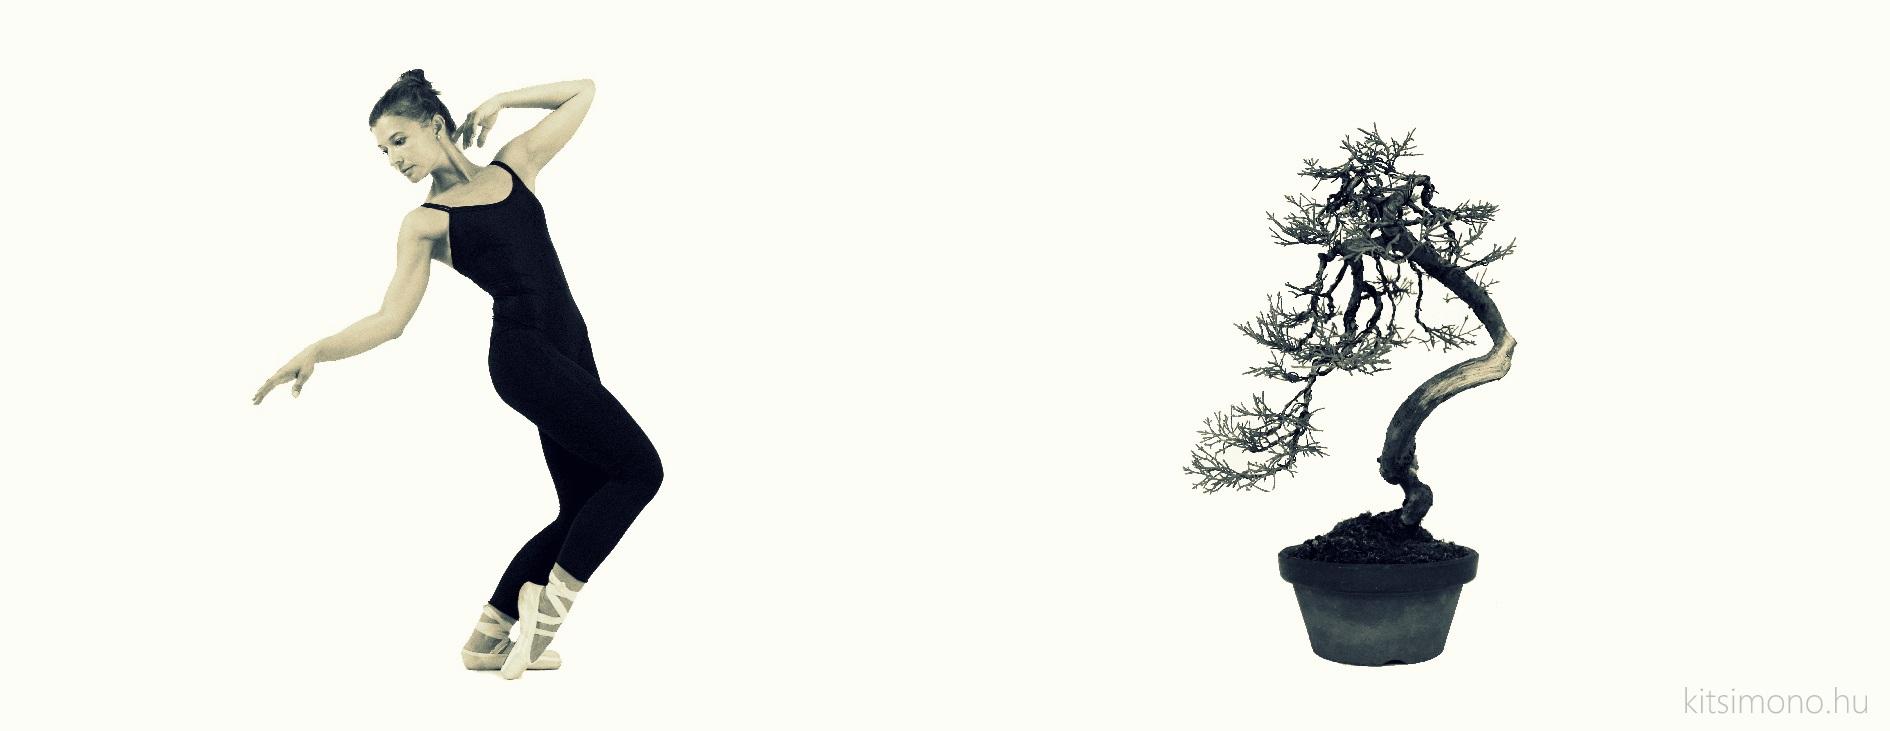 juniperus chinensis literati bunjin bonjin bonsai ballet dance kitsimono (7) másolata